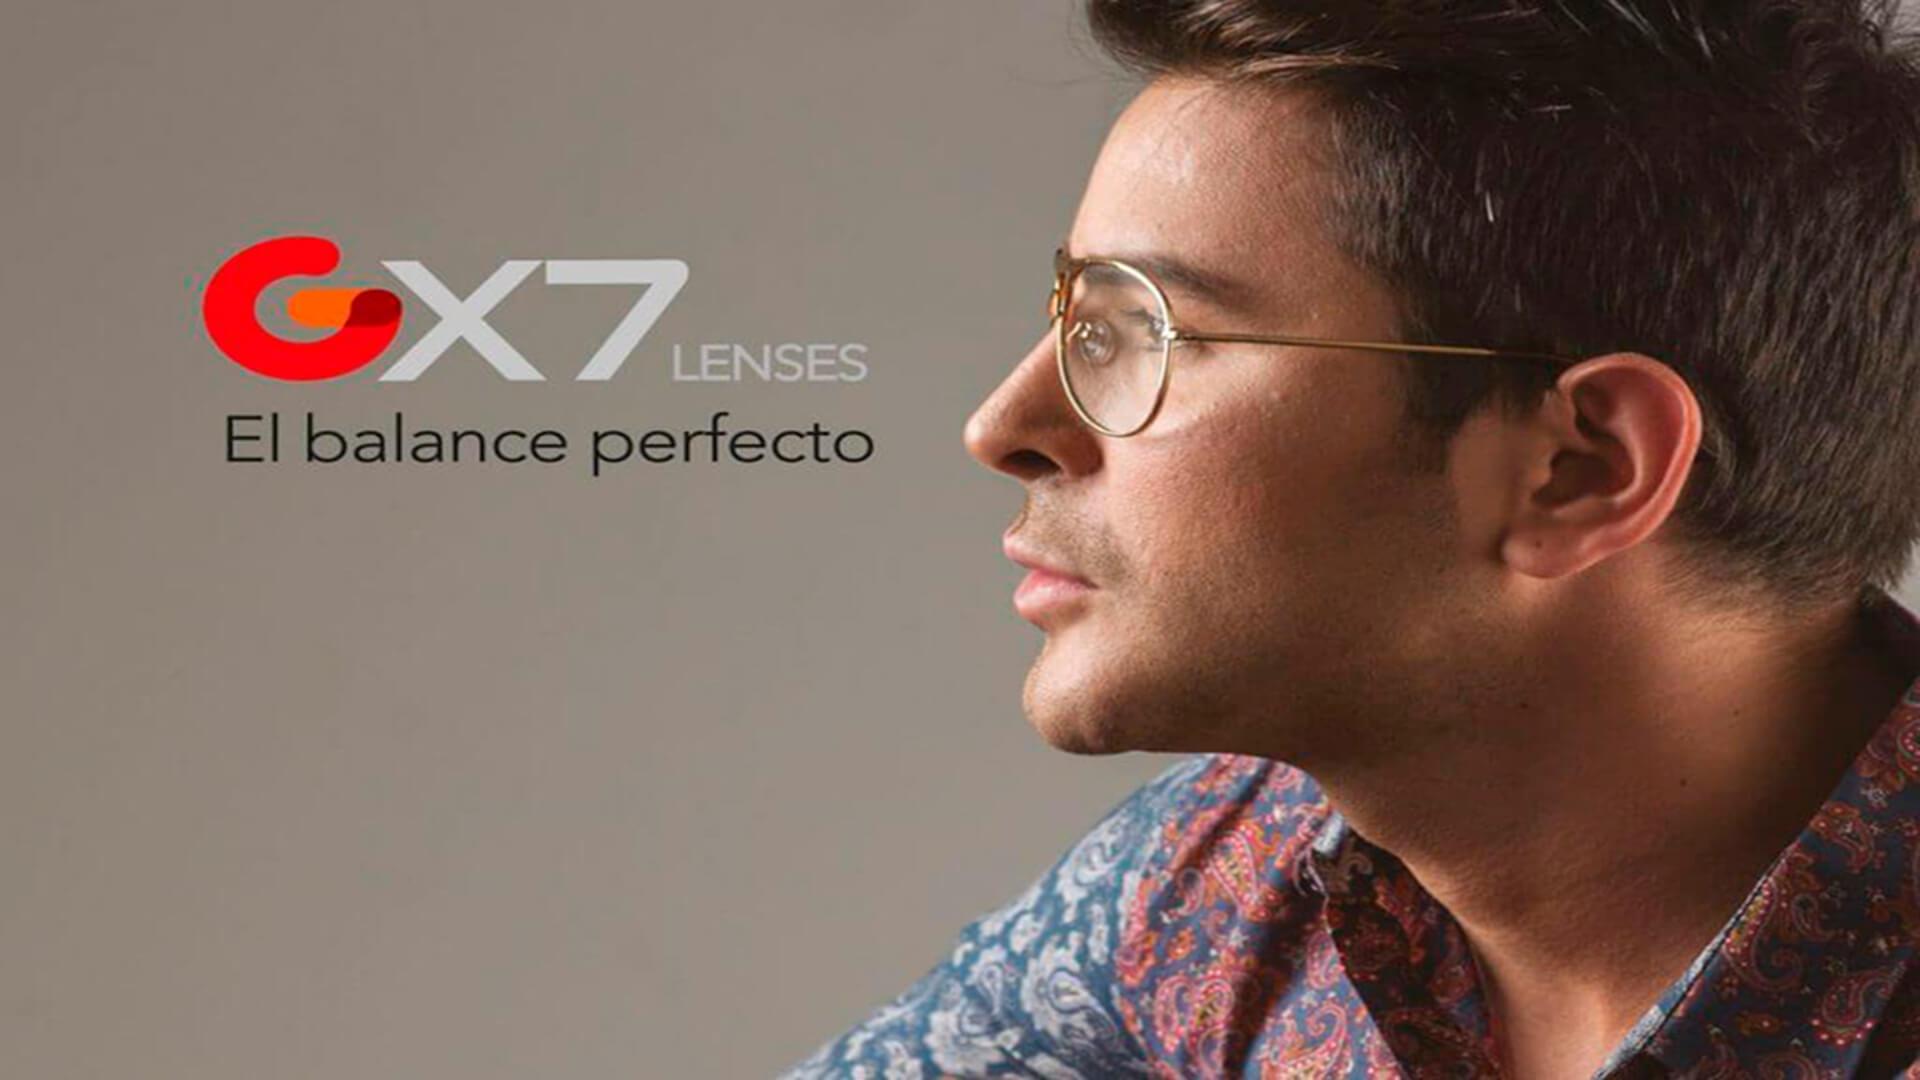 Serie GX7